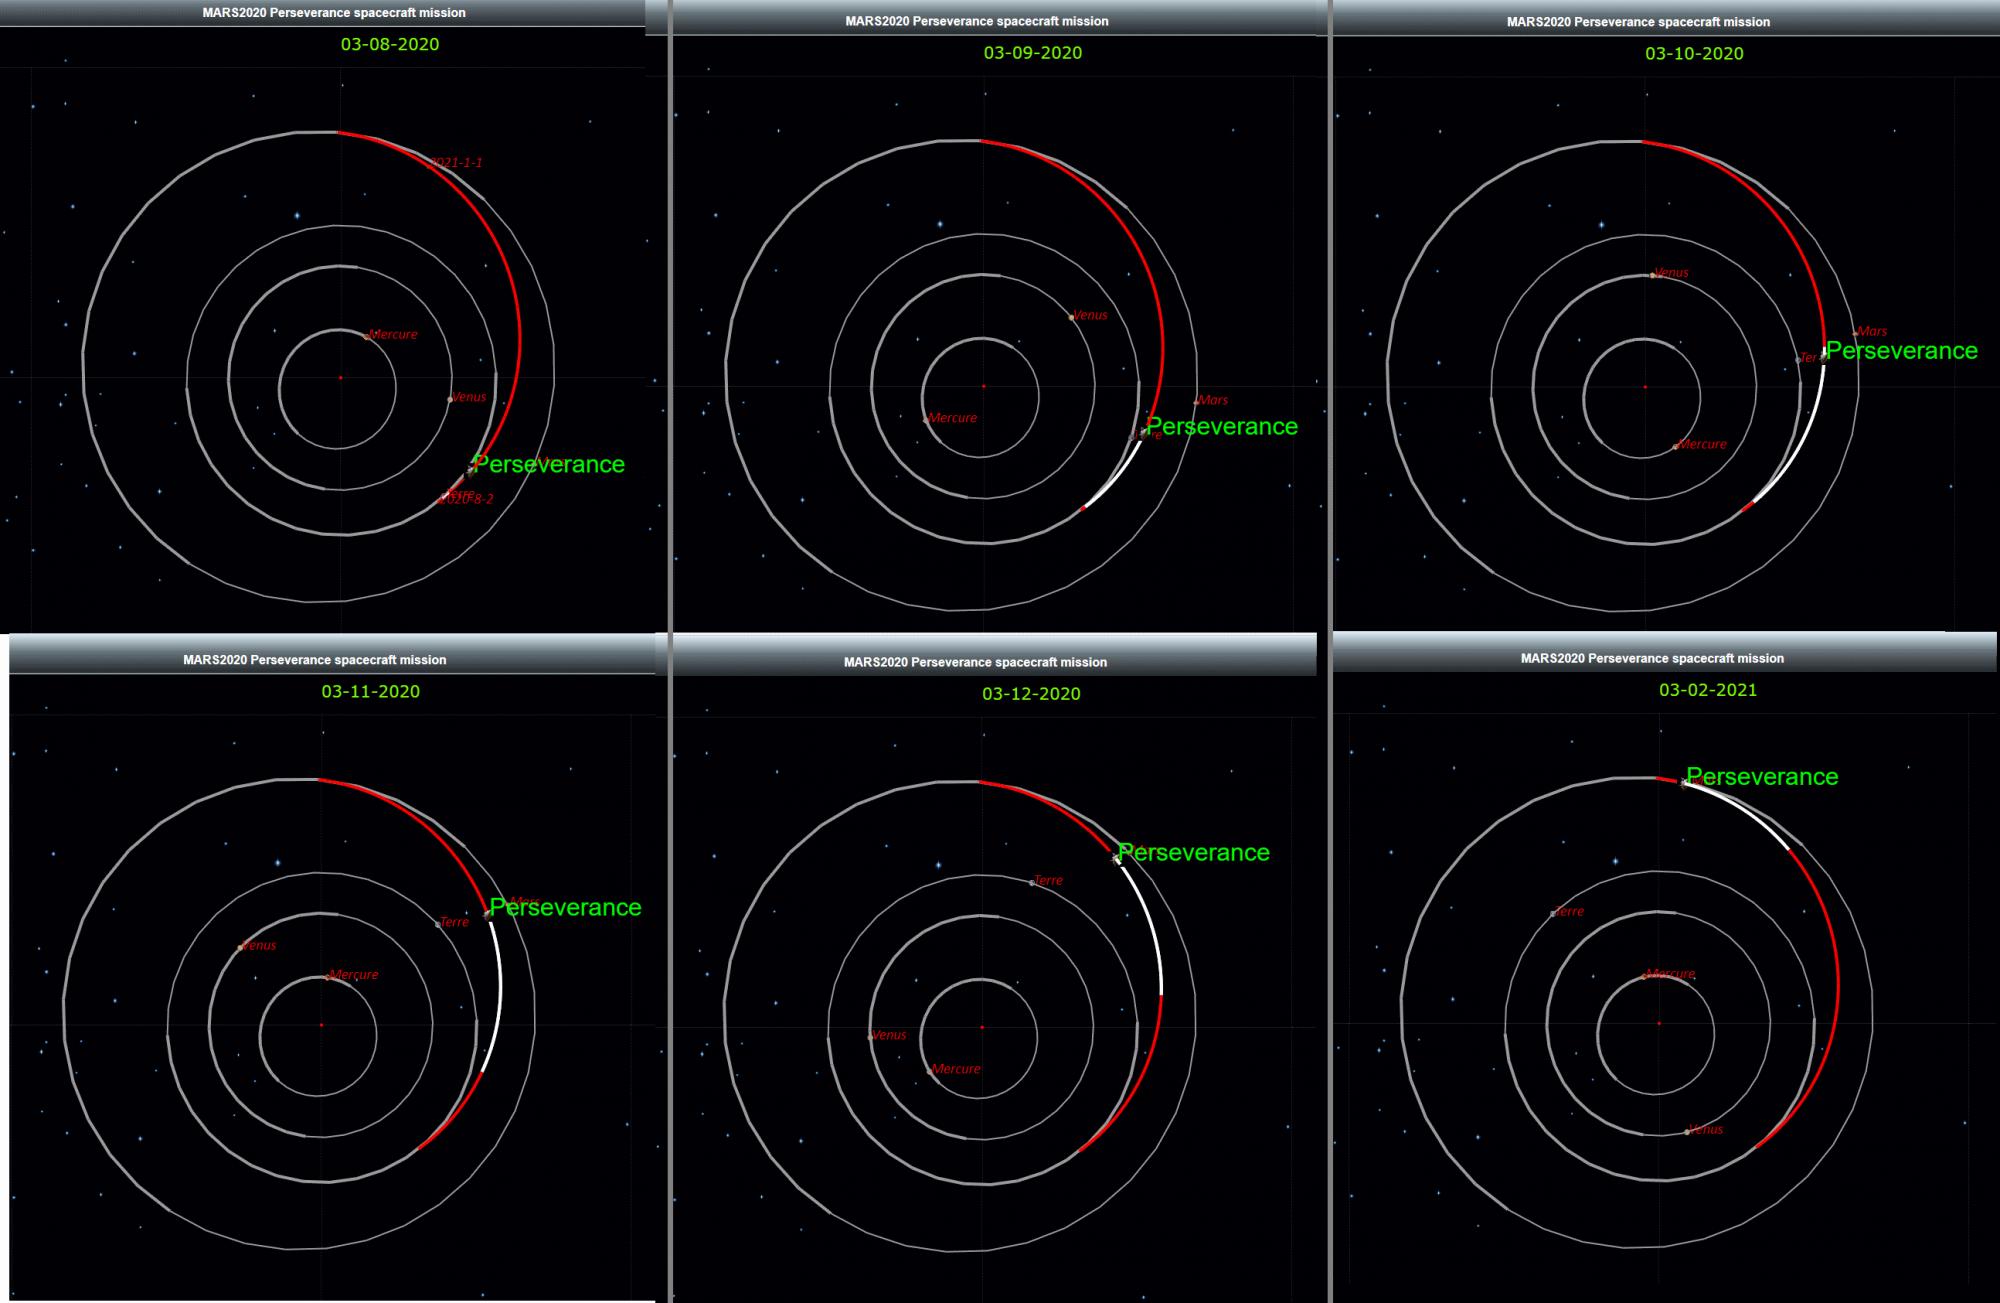 MARS2020trajectory.thumb.png.b2420c437aa5be28cd9a36692762144a.png